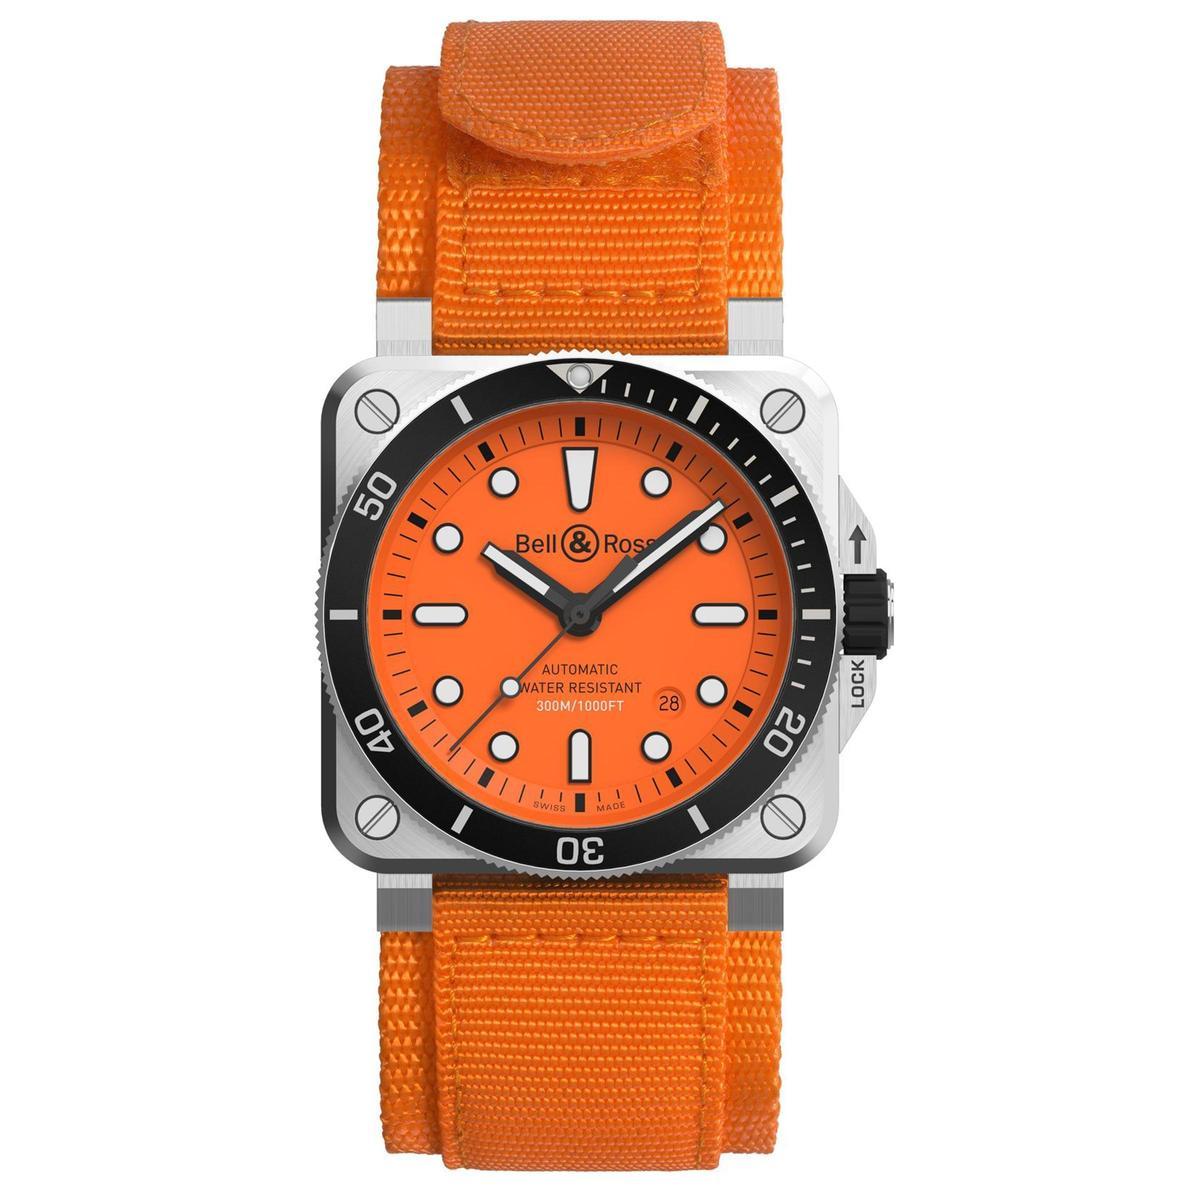 BELL&ROSS近幾年潛水錶主力BR 03-92 Diver,此次推出橘色限量版本,全球限量250只,定價NT$123,000。